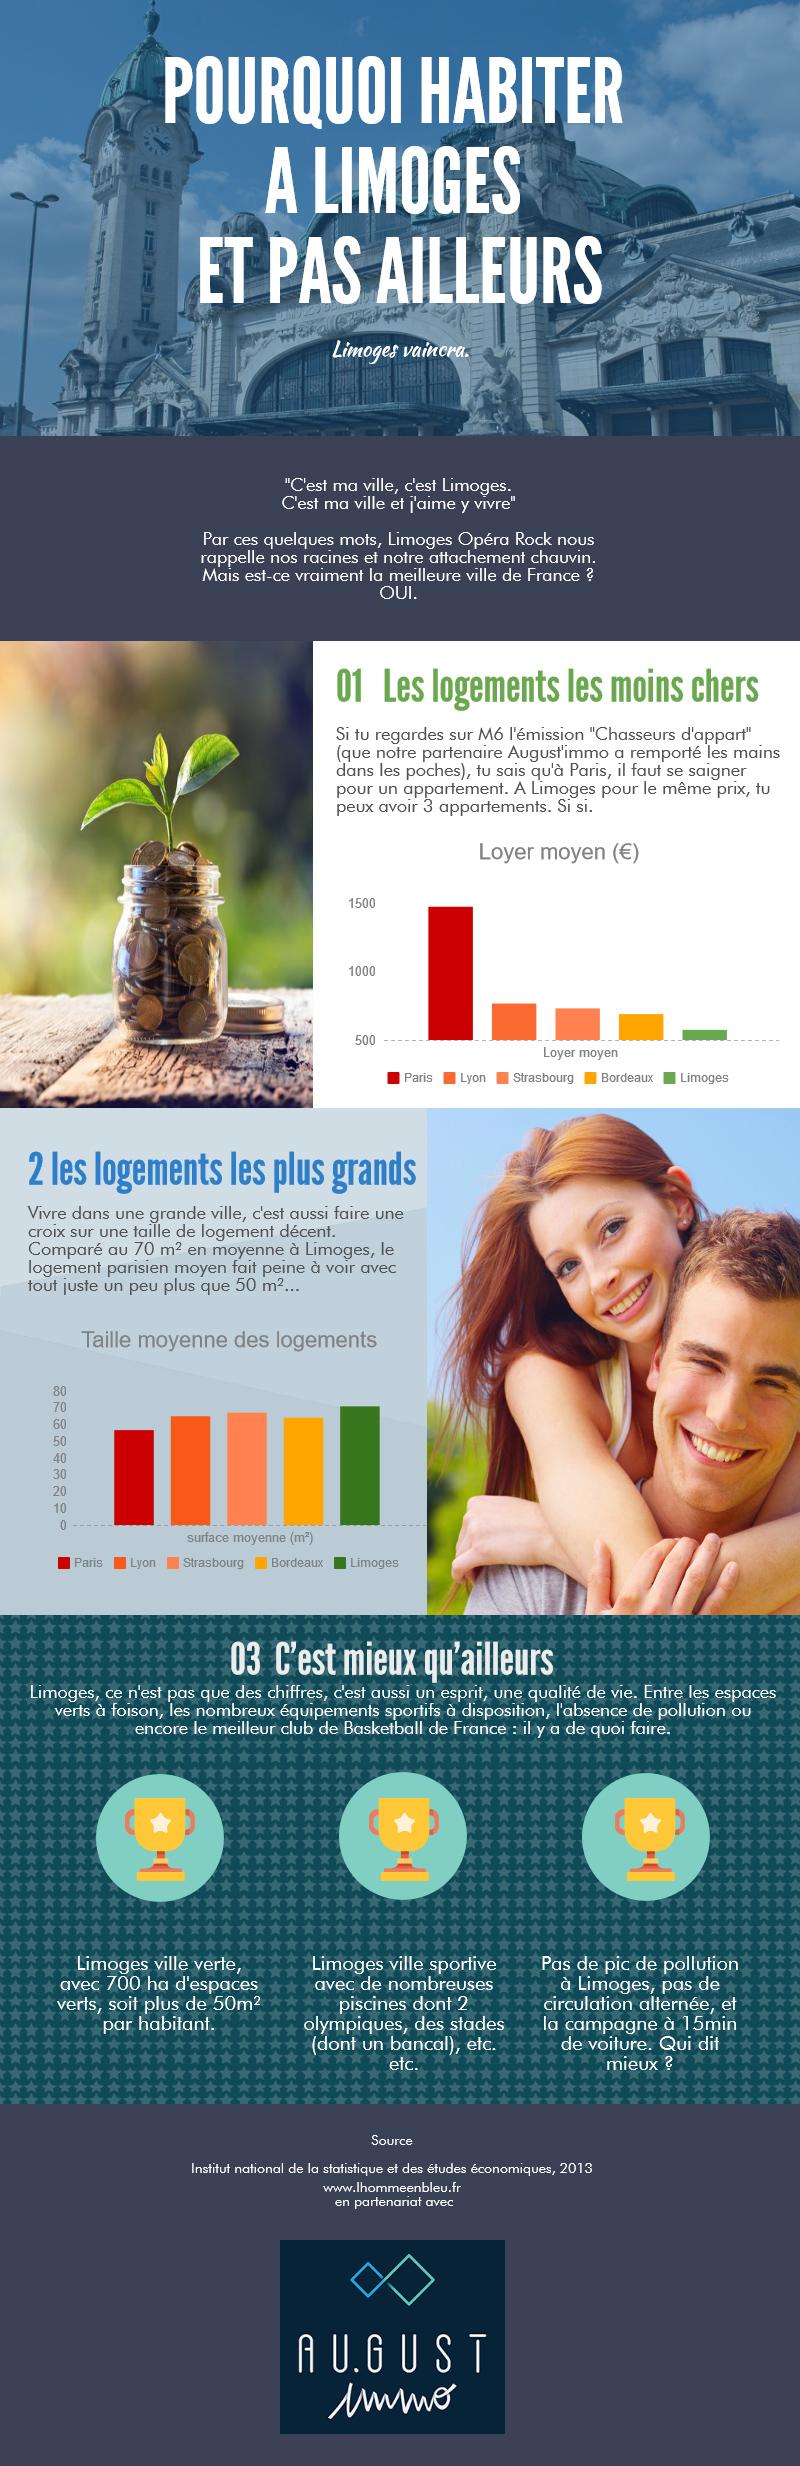 infographie-pourquoi-habiter-limoges